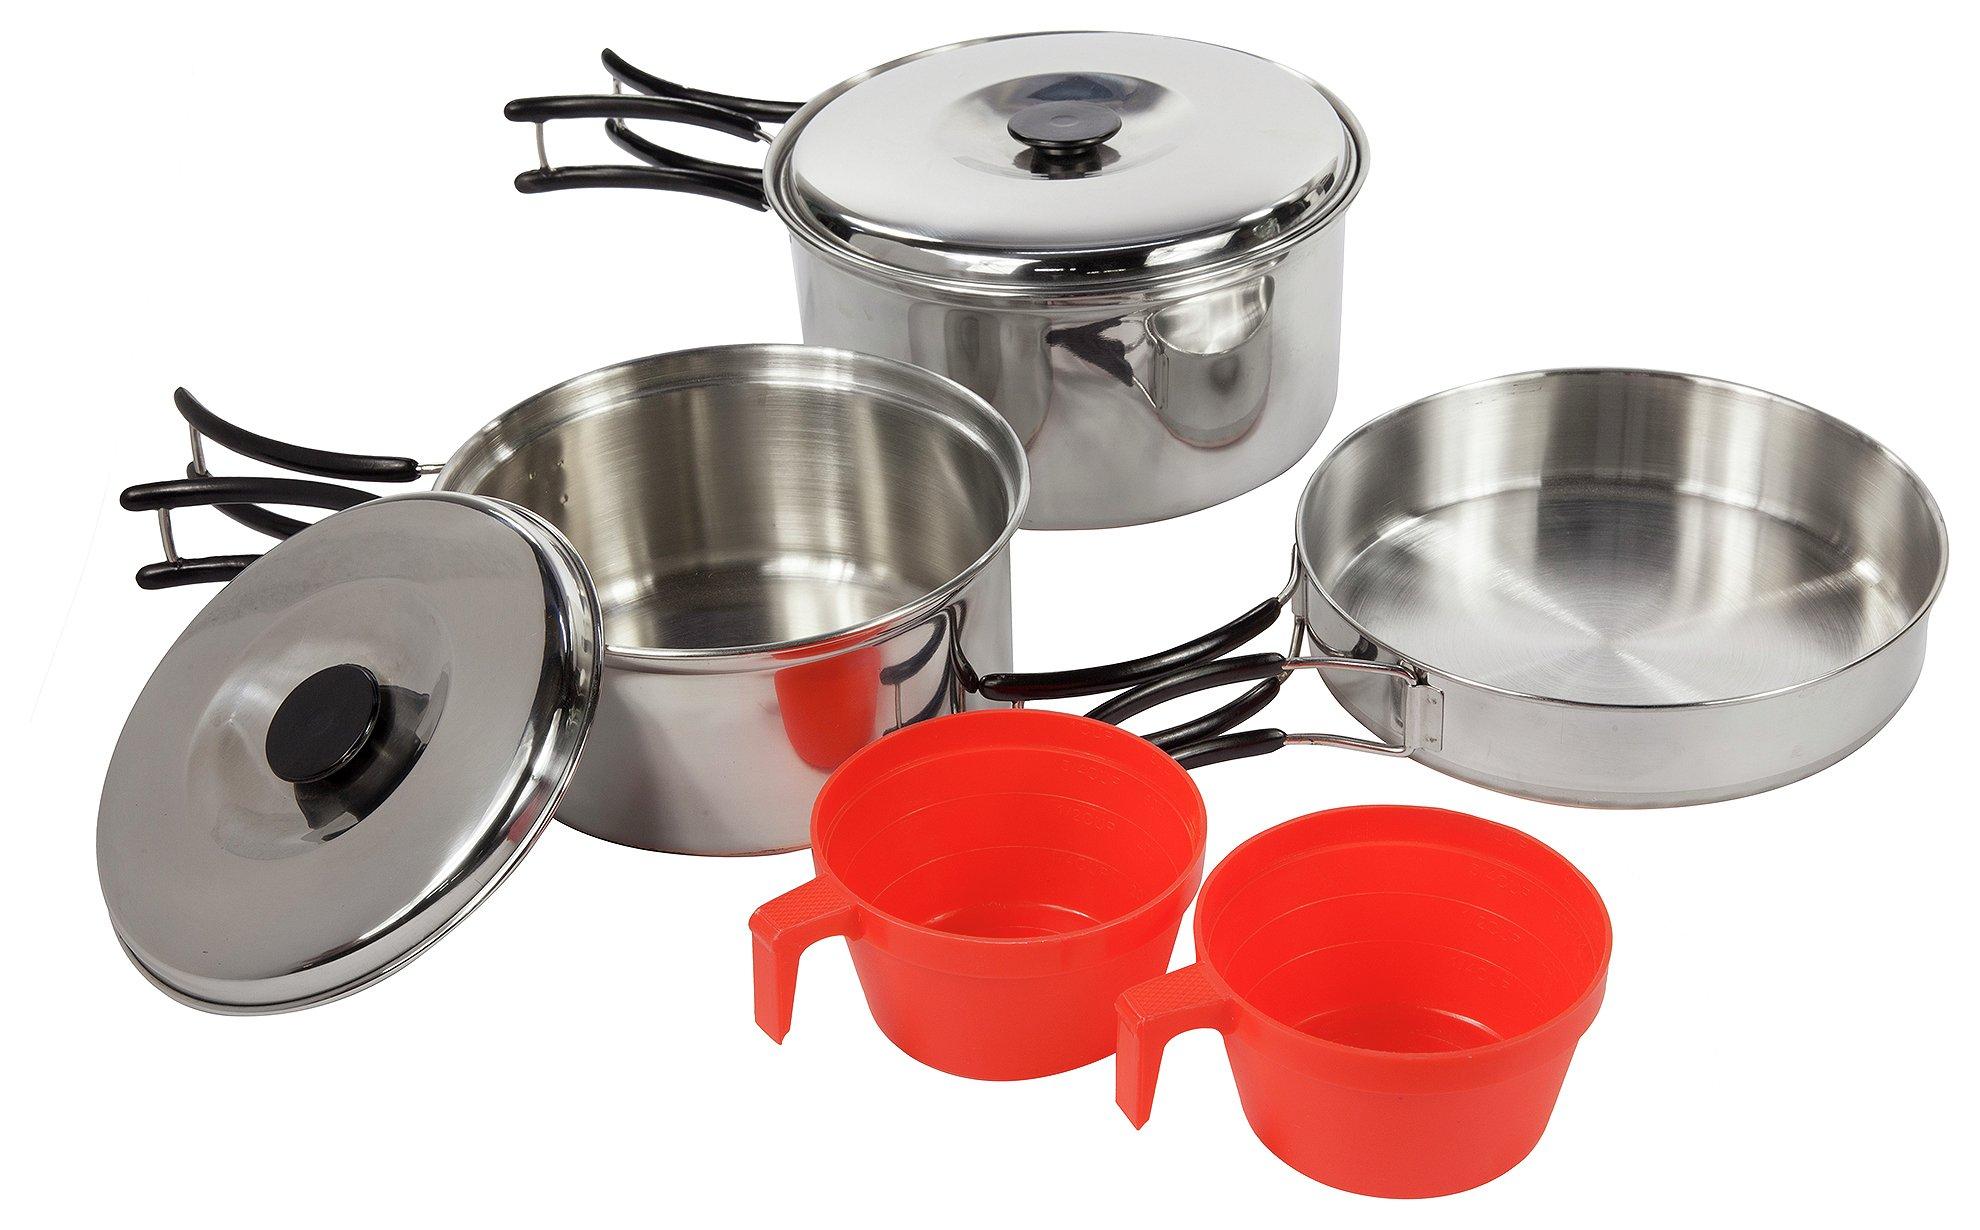 Regatta Silver Compact Cook Set.